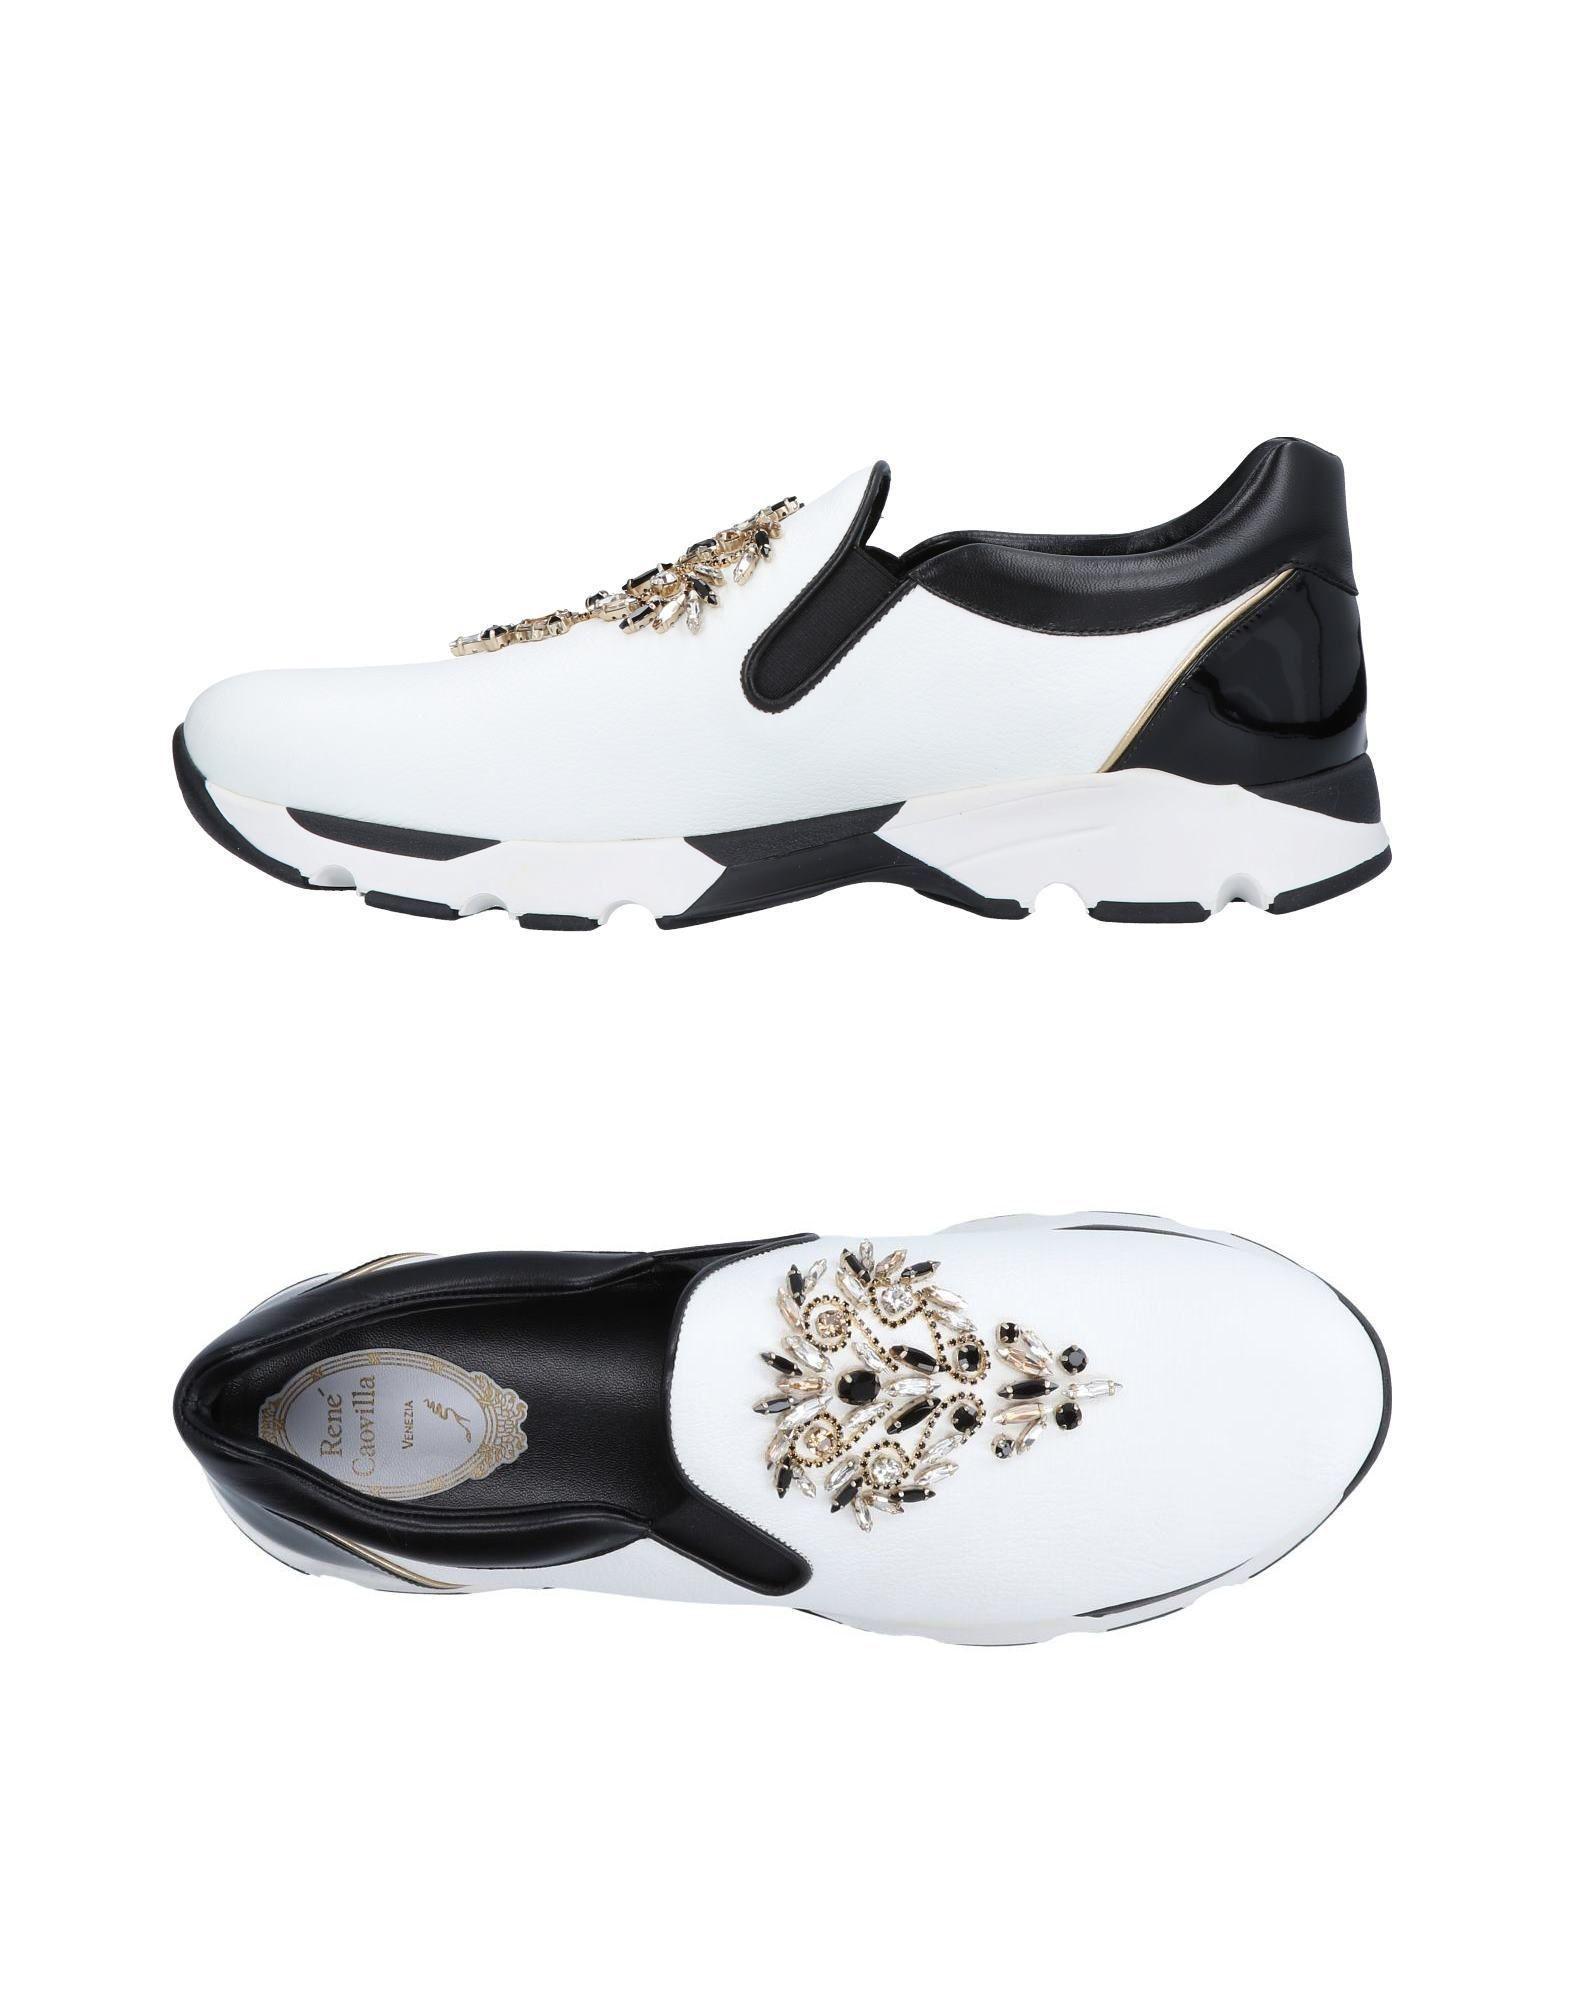 Rene Caovilla. Women's White Low-tops & Sneakers